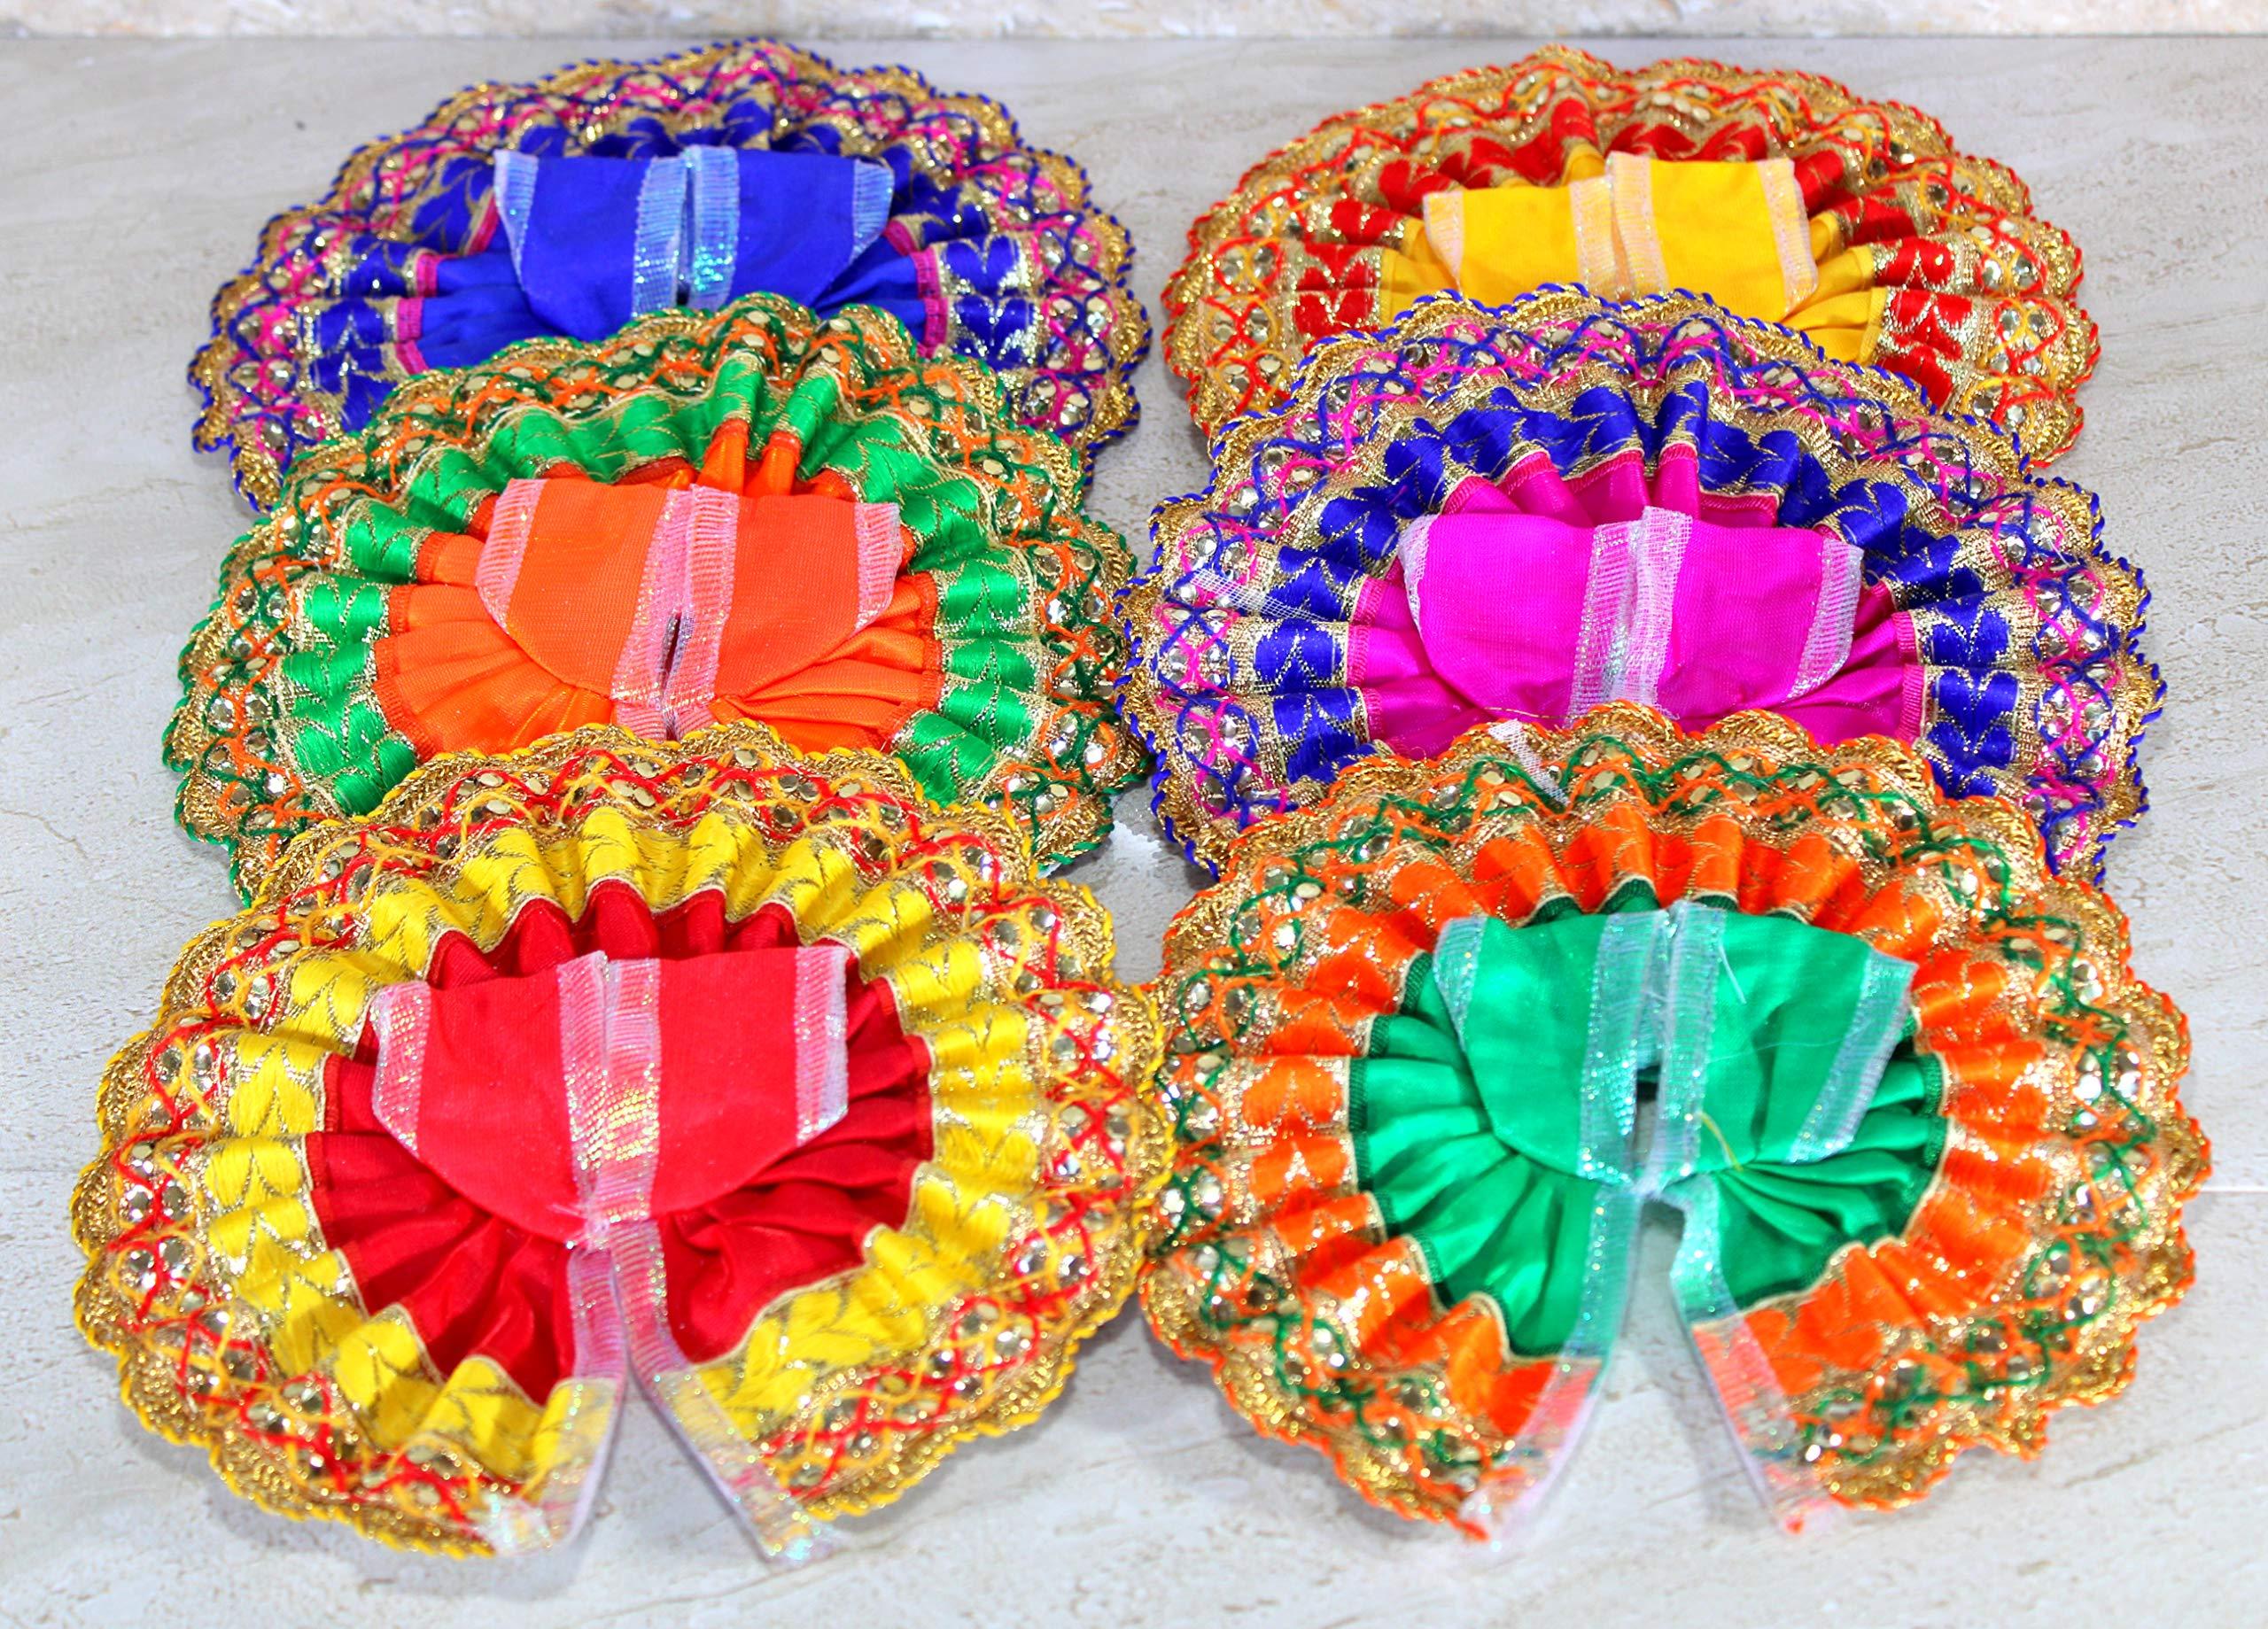 eSplanade Ladoo Gopal Poshak | God Dress | Bhagwaan Ki Poshaak | Dev Vastra - (Set of 6) Laddu Gopal Idols (2)